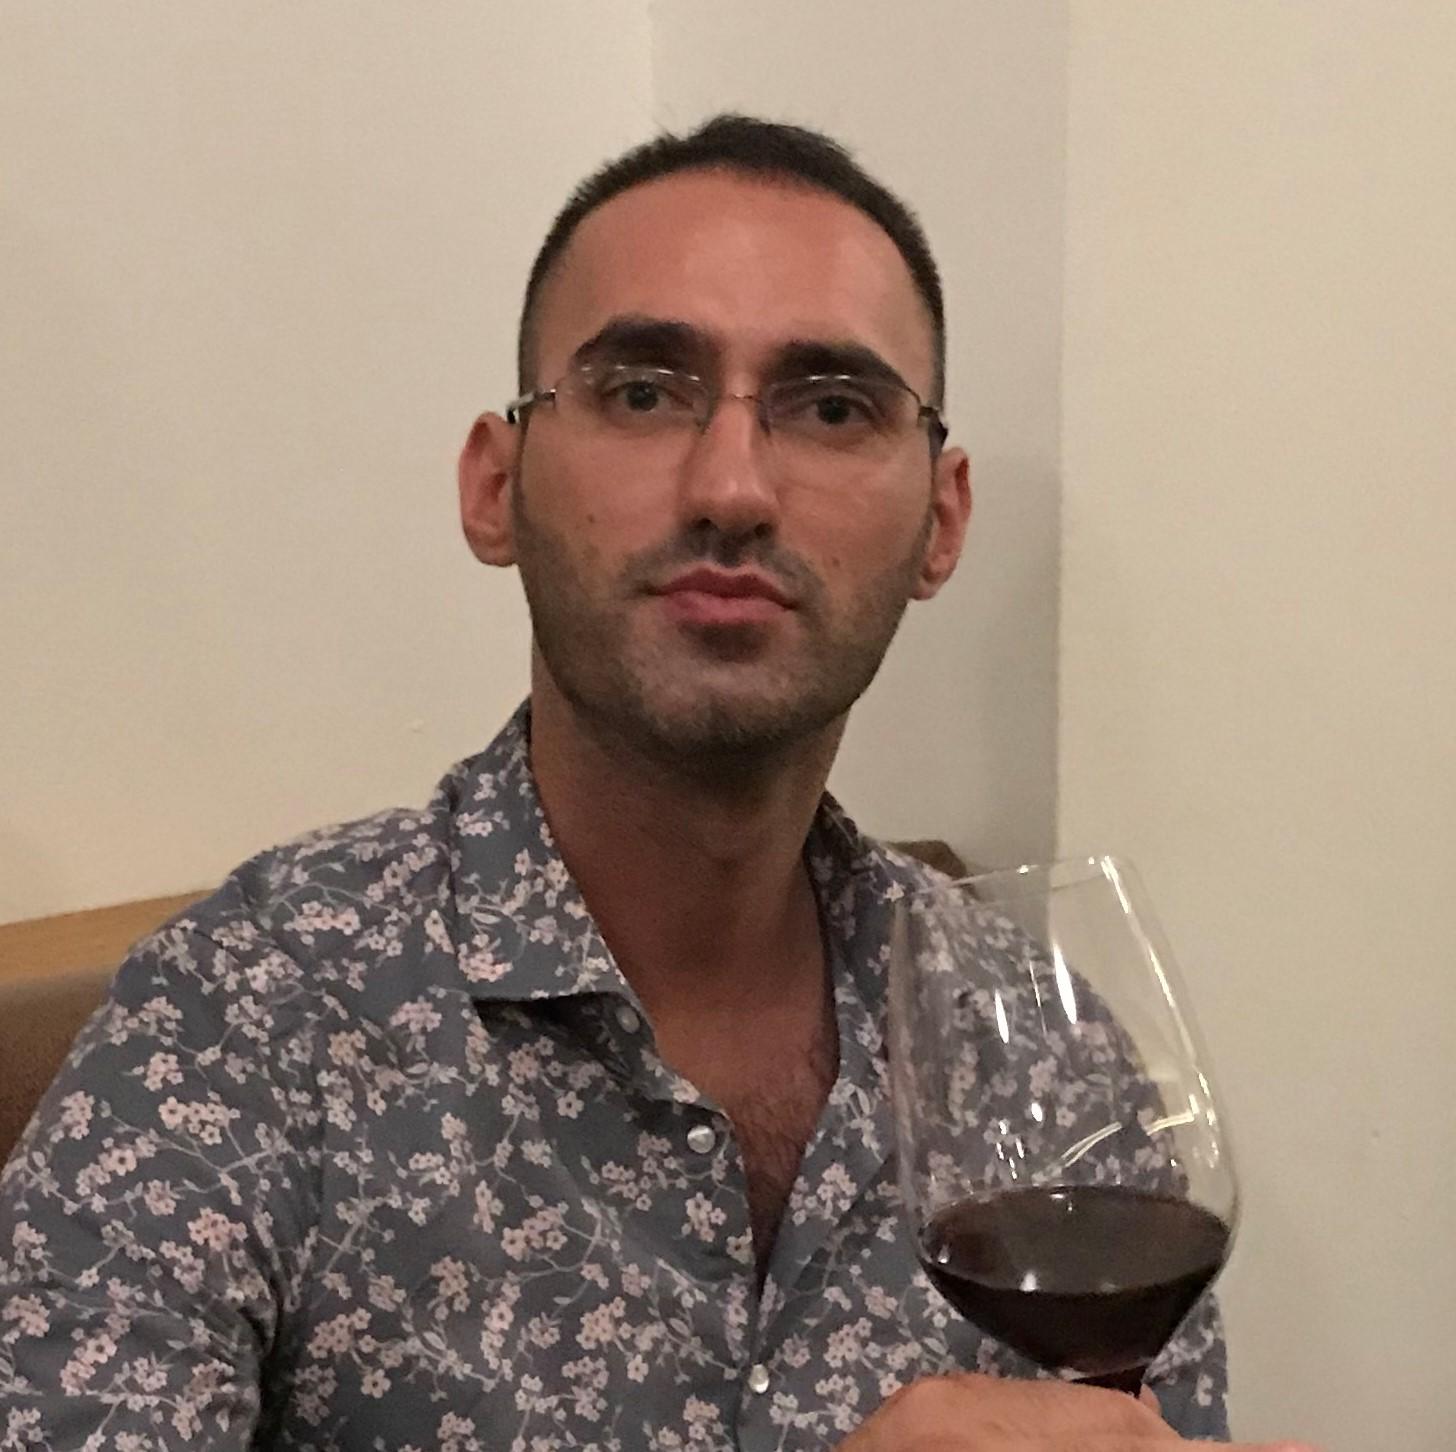 Mann, Wein, Calice d'Oro, Deniz Cakal